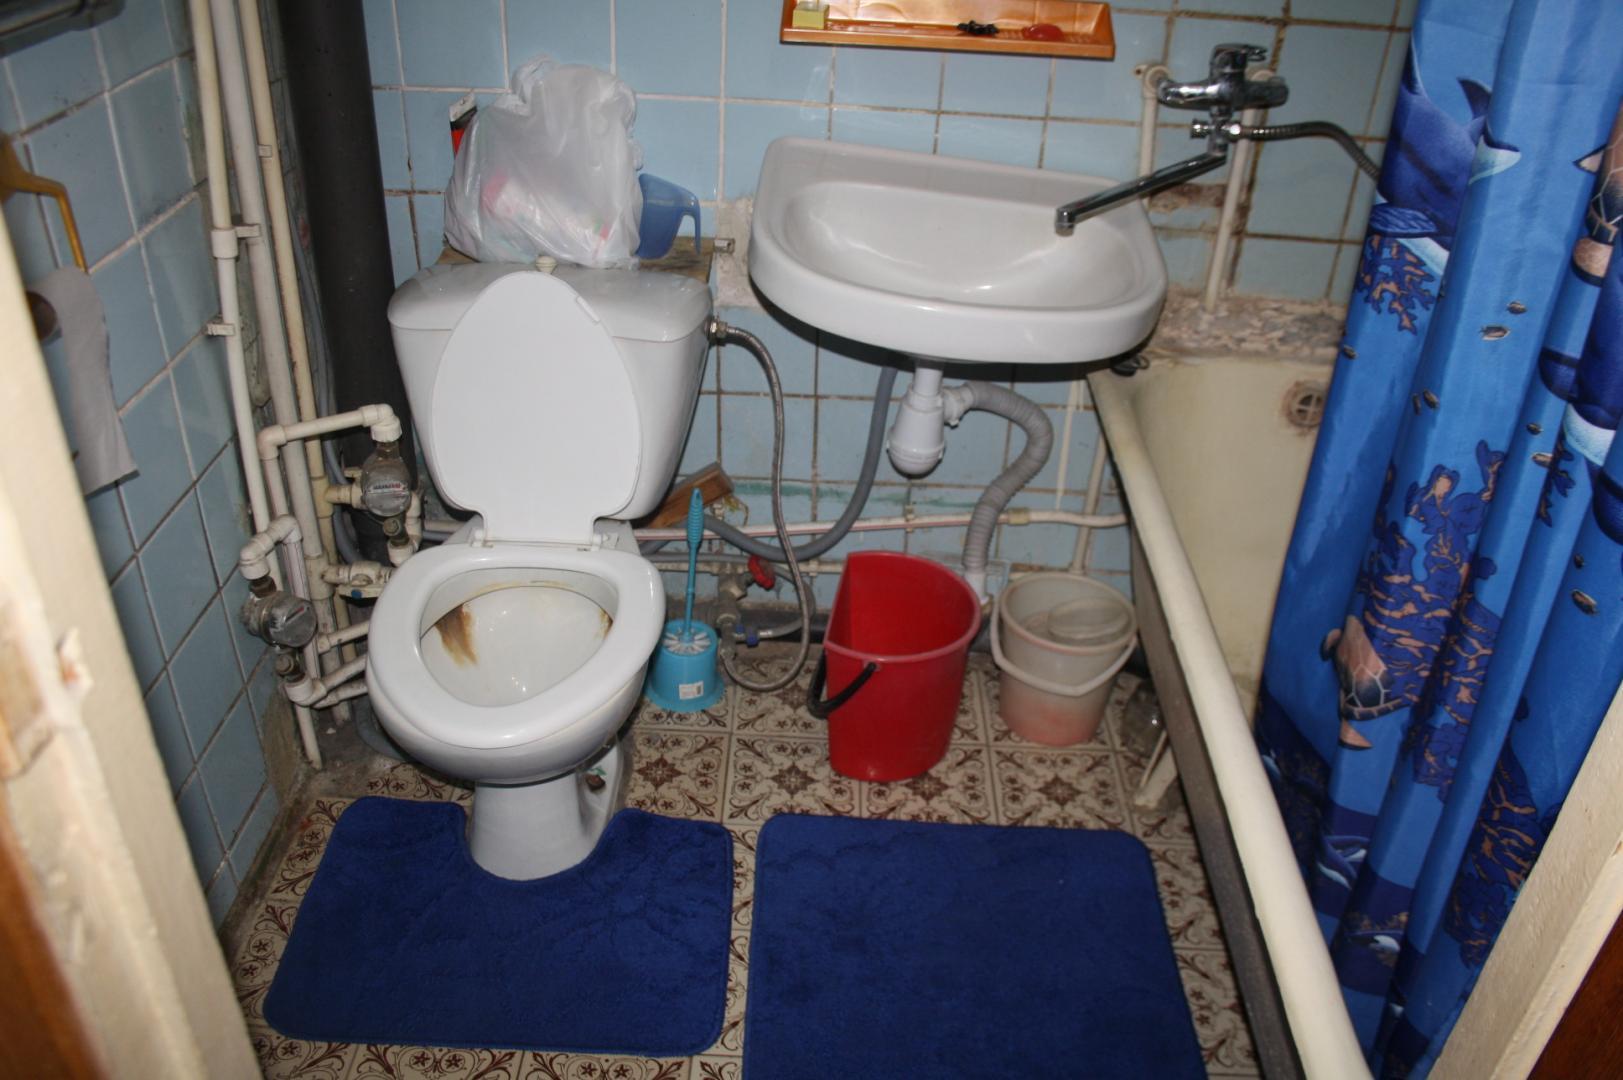 Квартира, 1 комната, 35 м² в Люберцах 89160792833 купить 4